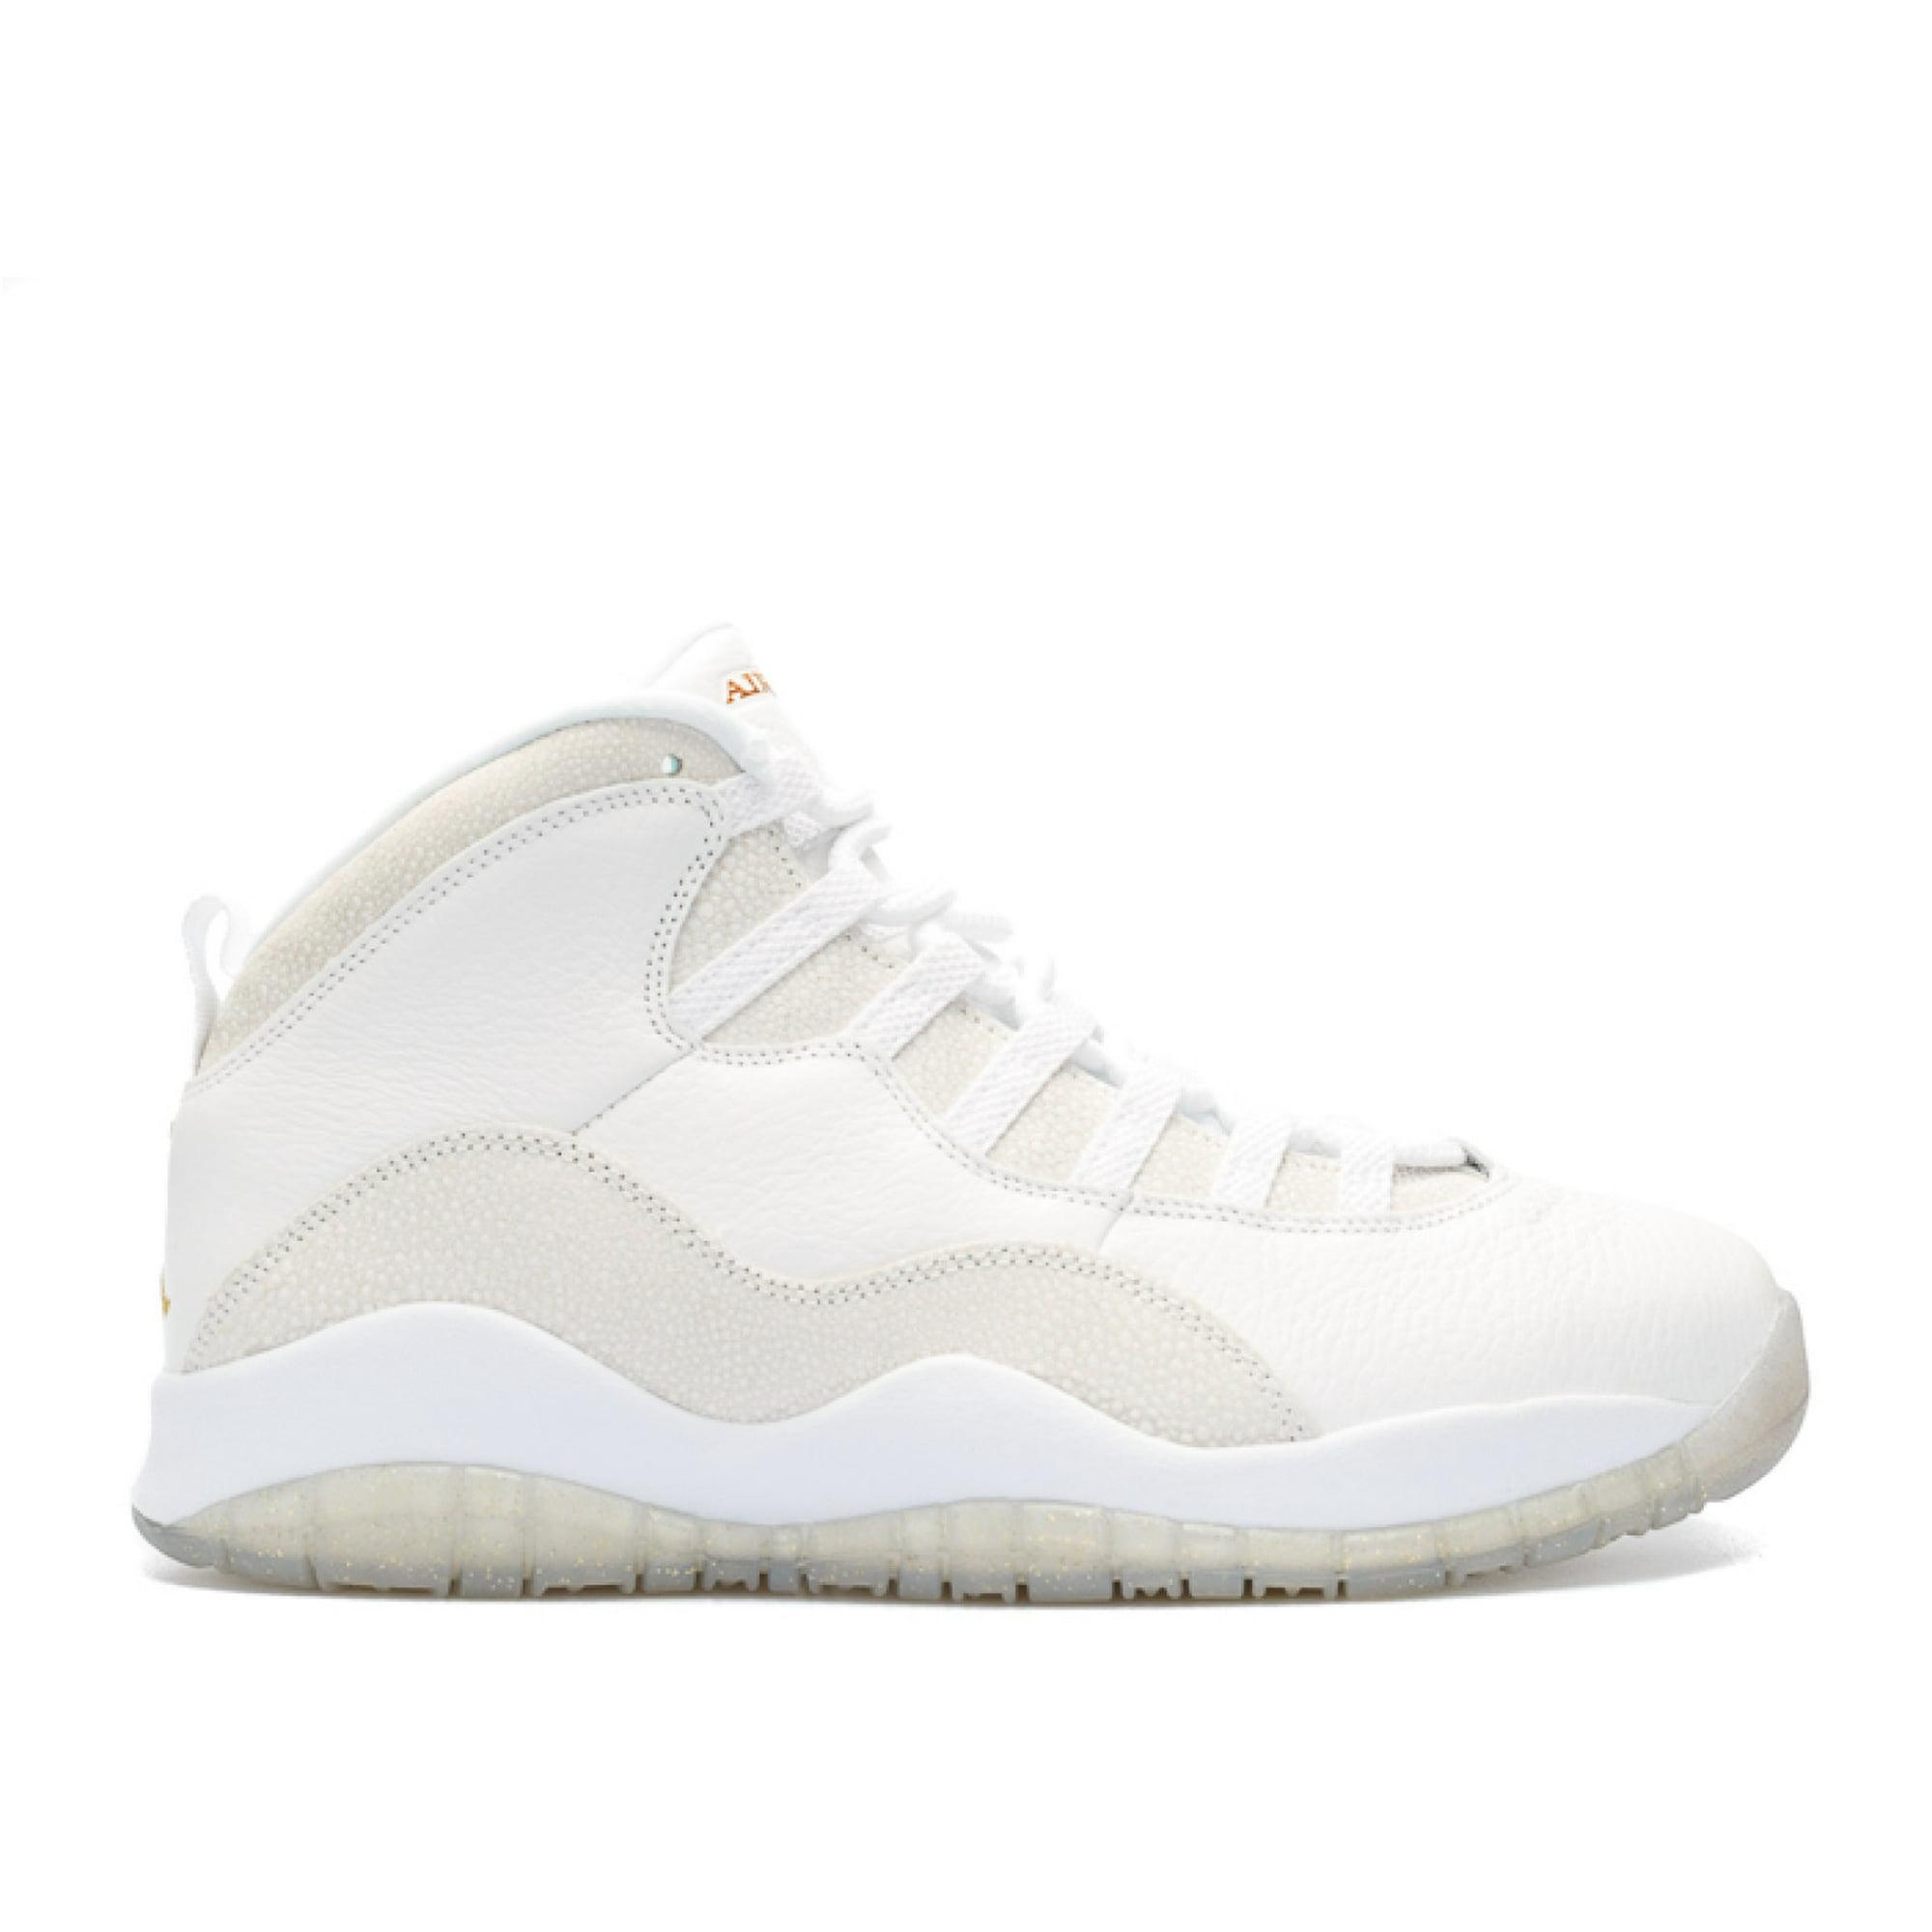 3c39bac3275 Air Jordan - Men - Air Jordan 10 Retro Ovo 'Ovo' - 819955-100 - Size 9    Walmart Canada